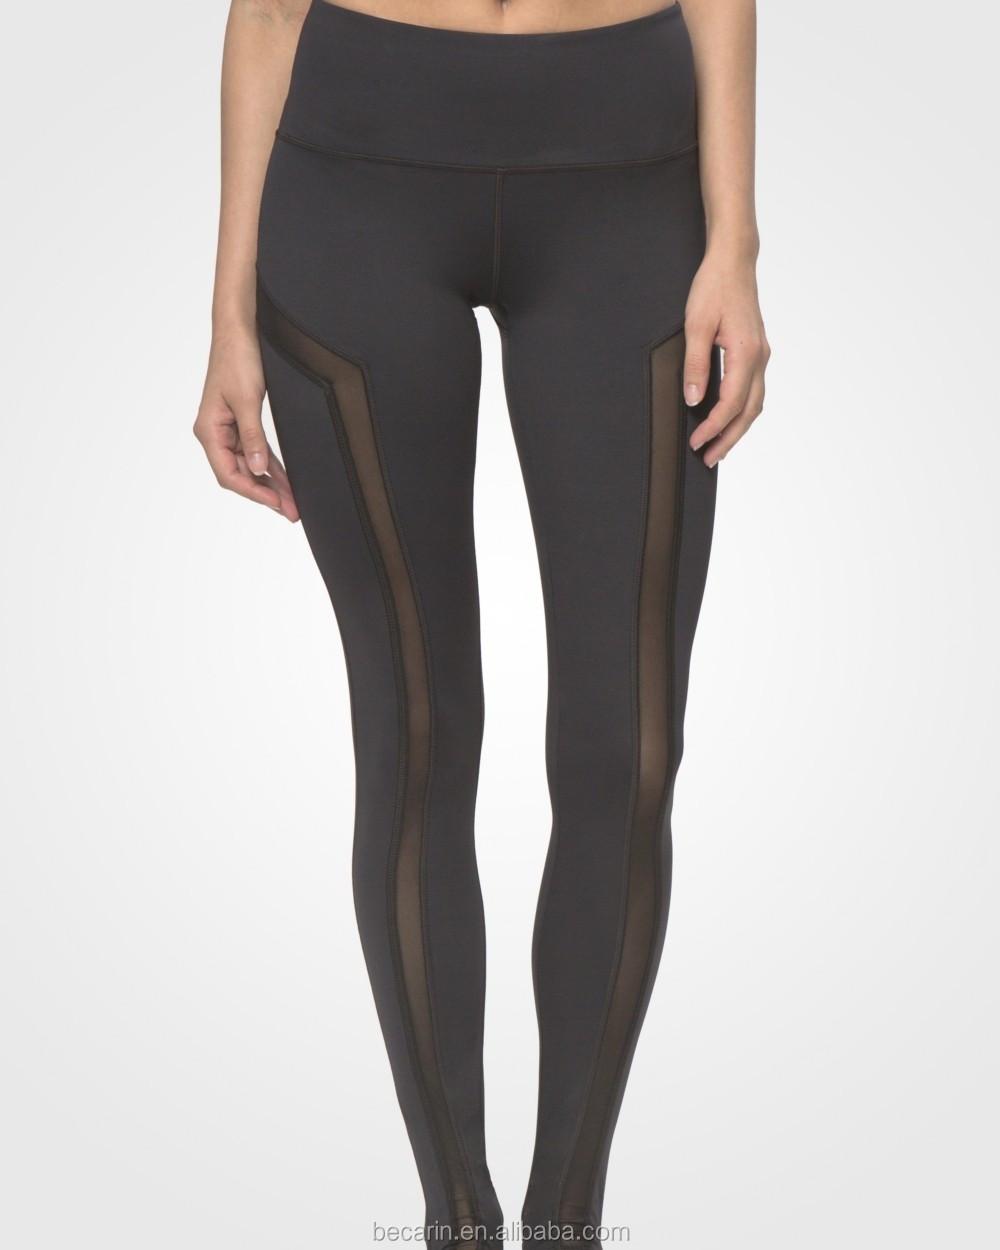 df8a3c066bd9ba custom sexy black mesh over heel extra long yoga pants girls leggings  fitness wear